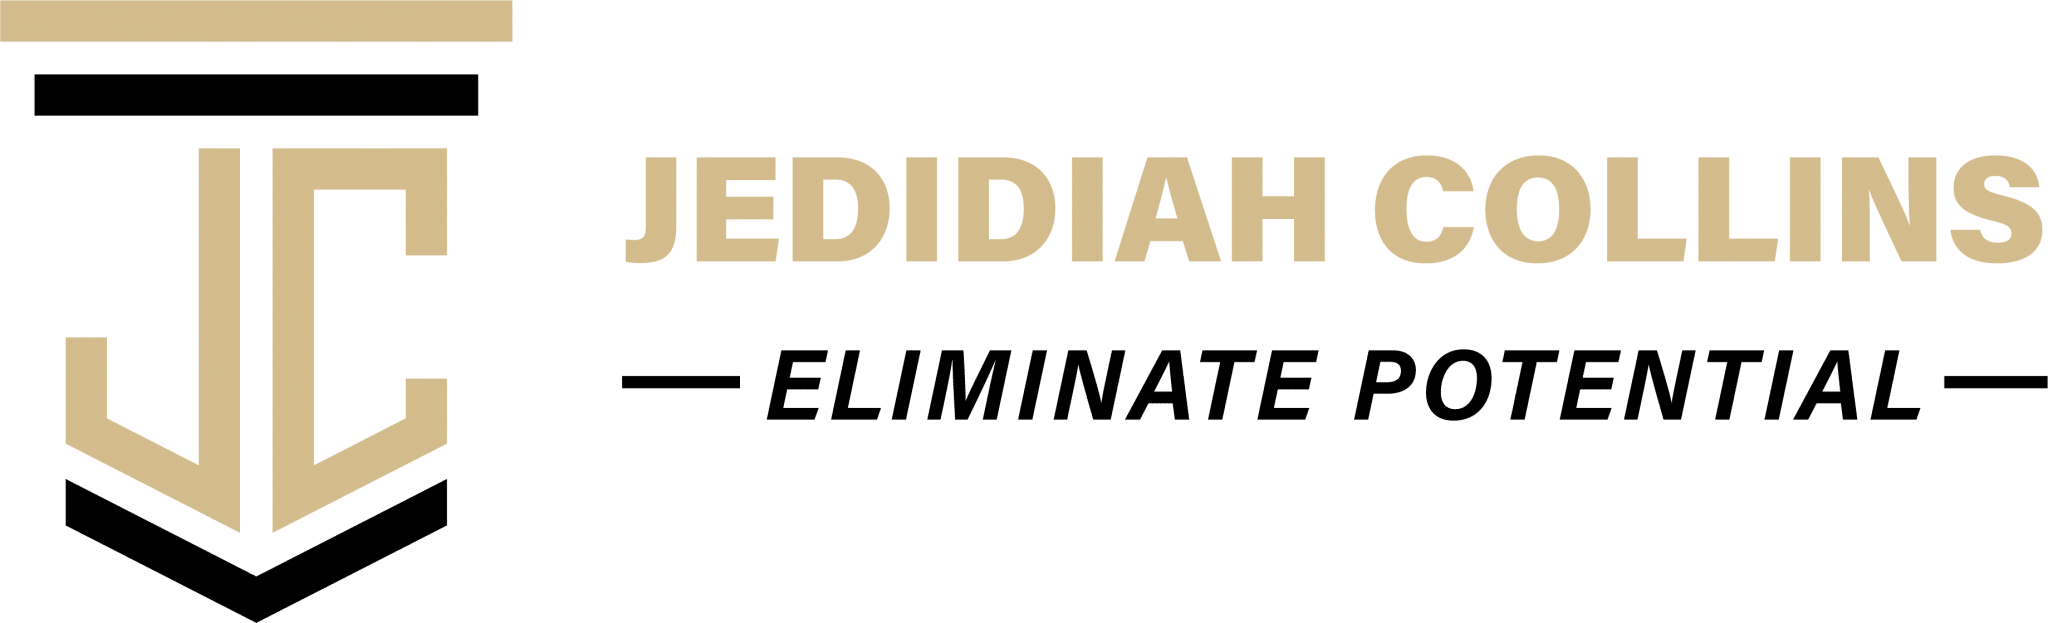 Jedidiah Collins